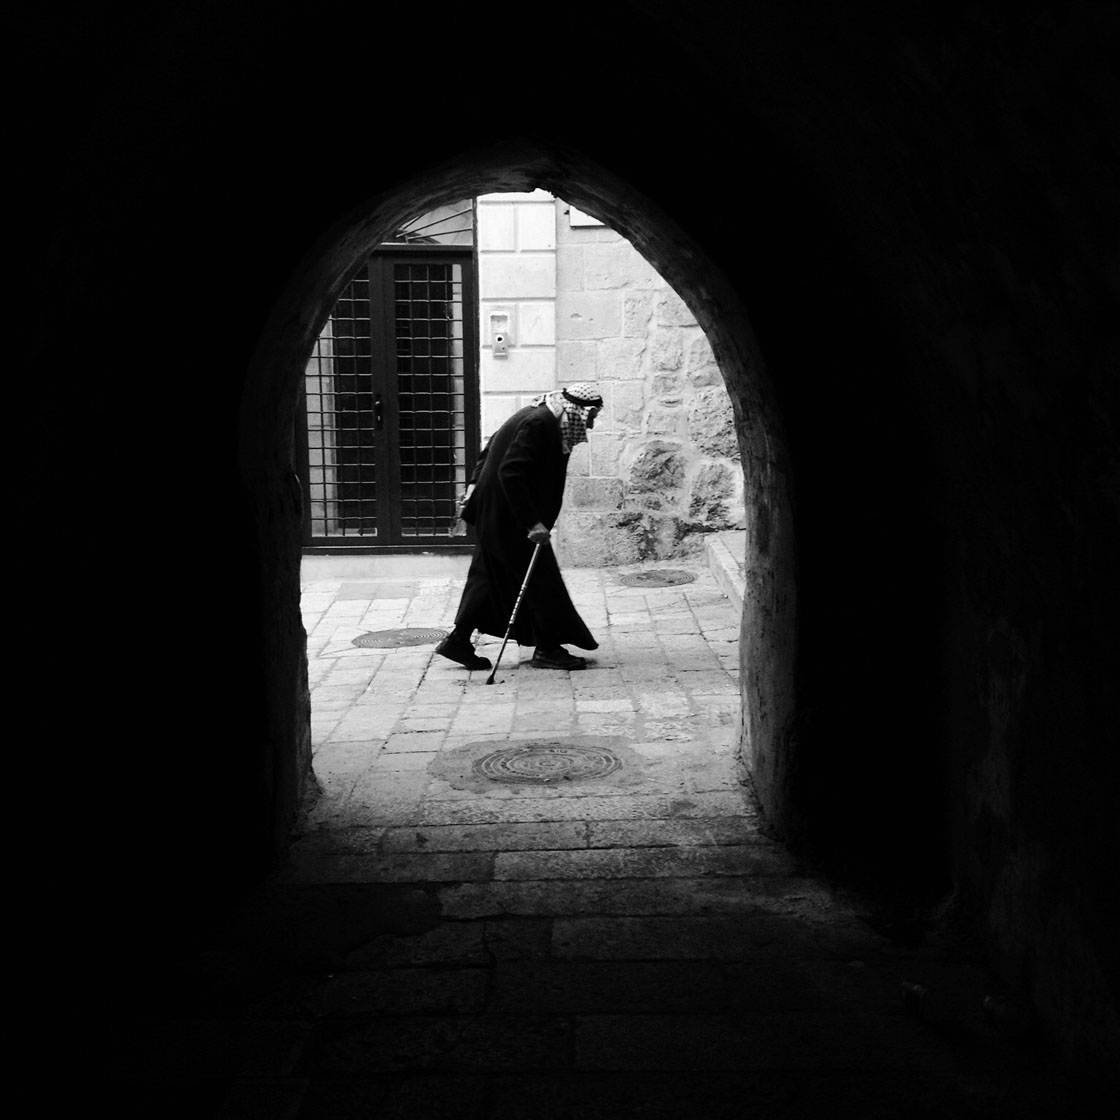 Black & White iPhone Street Photography 18